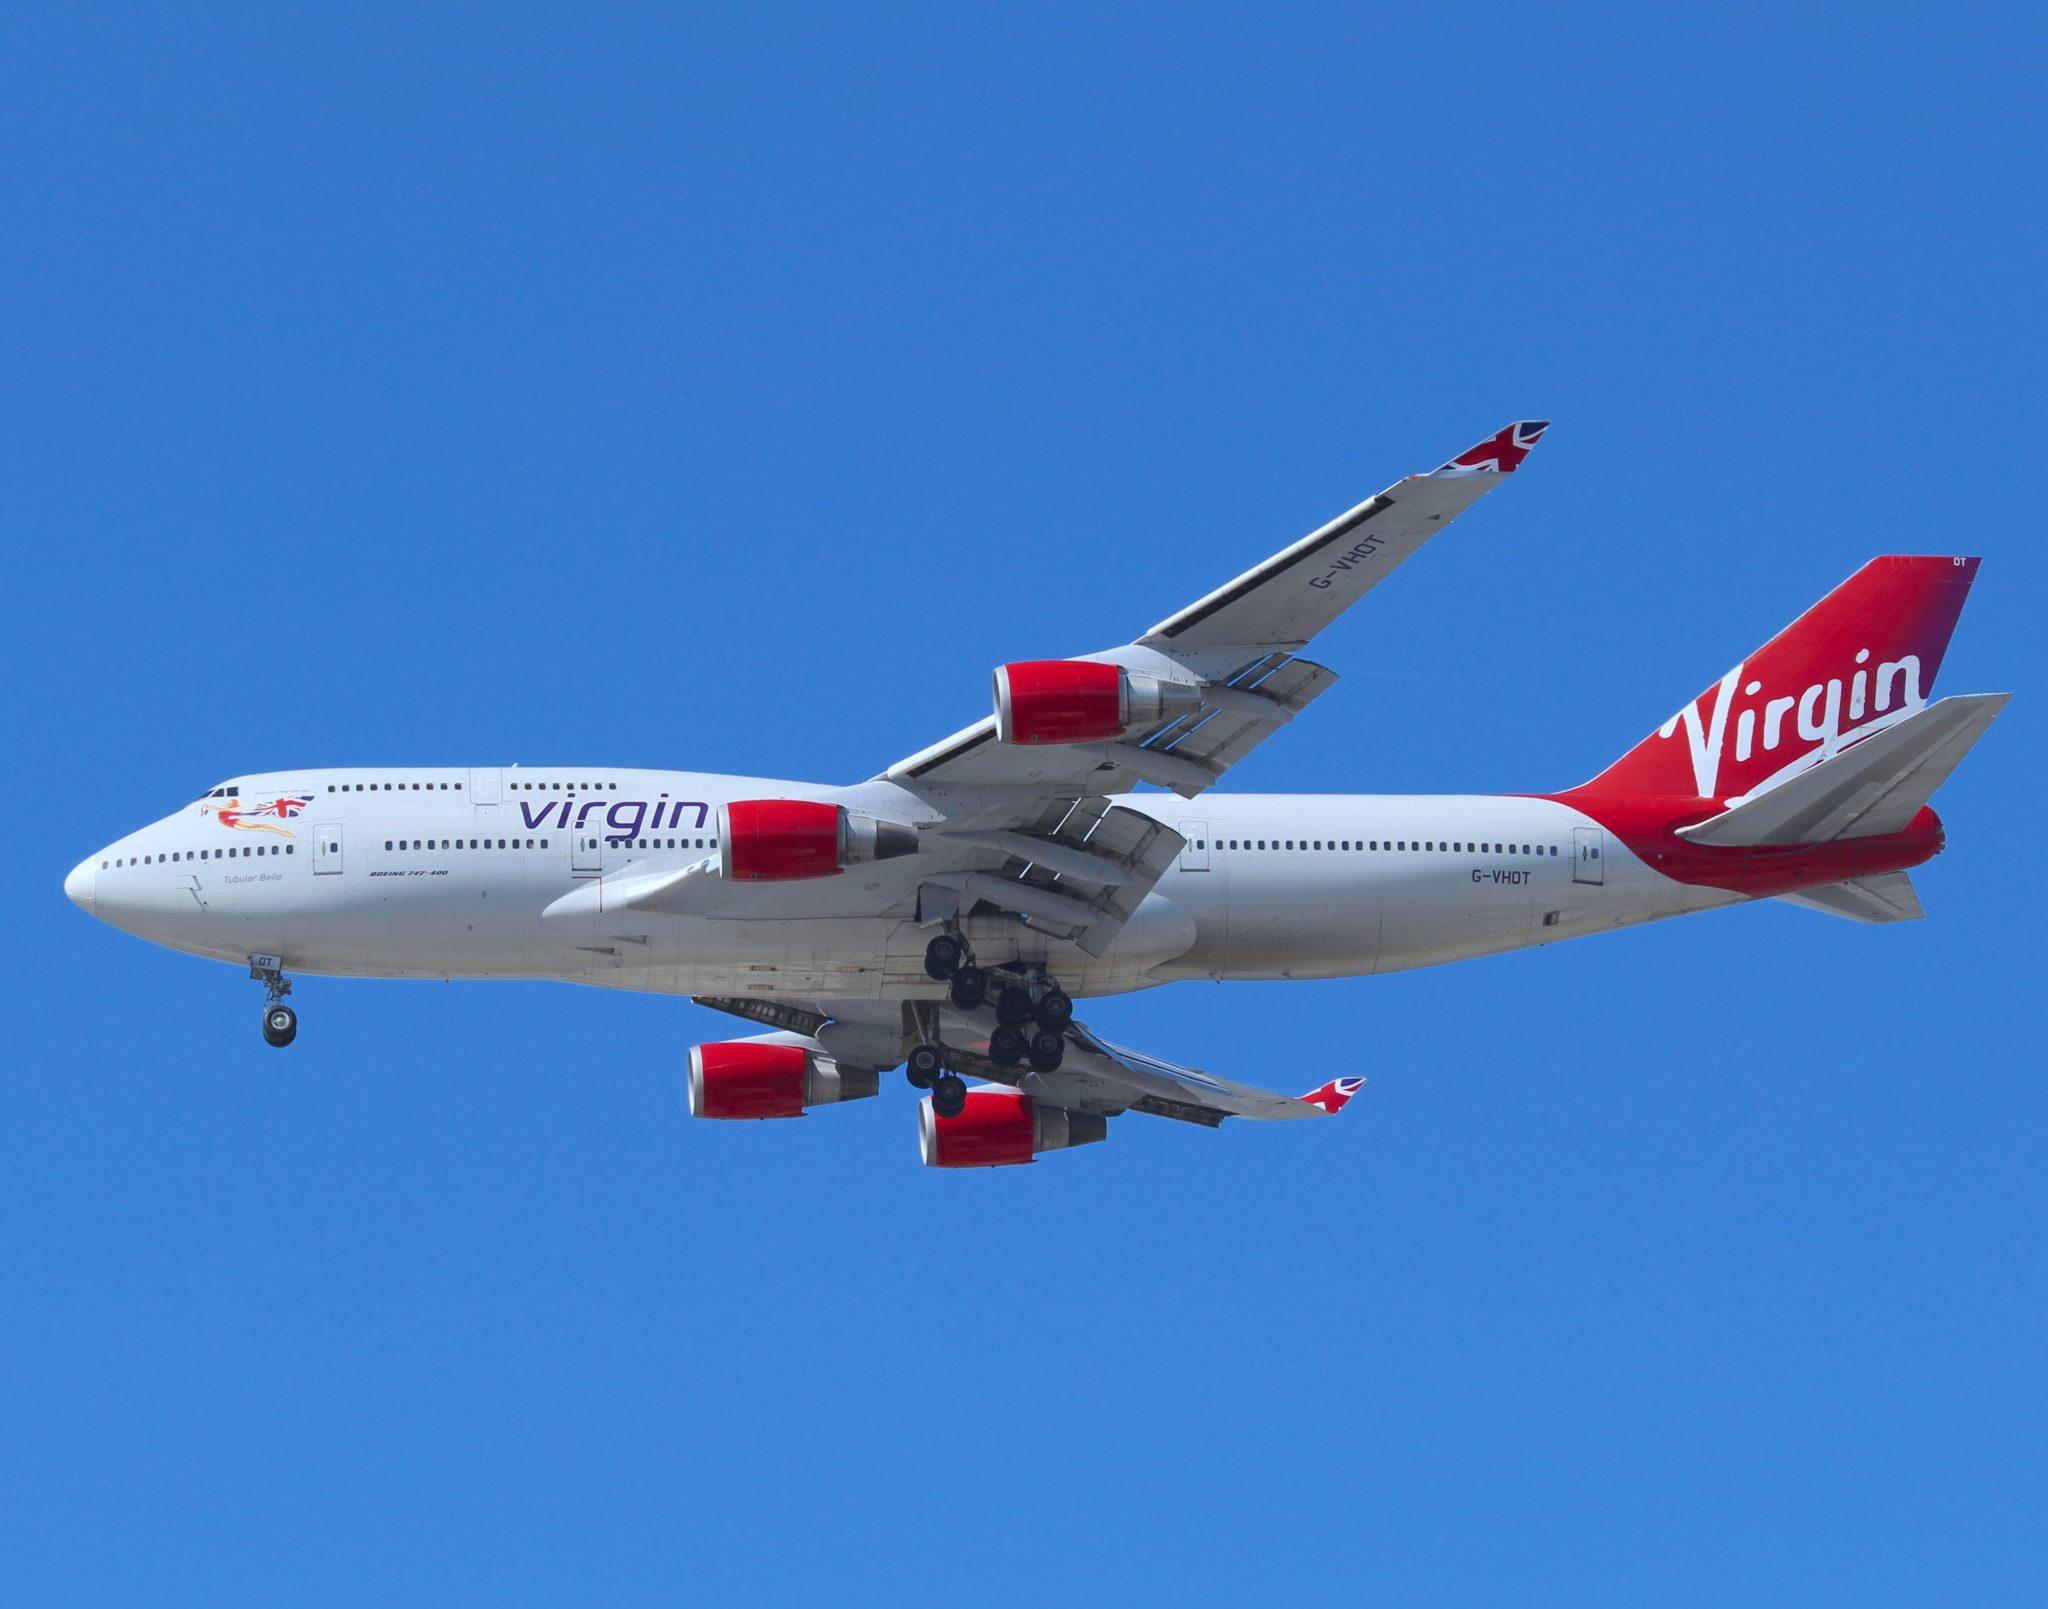 Virgin atlantic picks gogo 2ku inflight internet for Vibeline